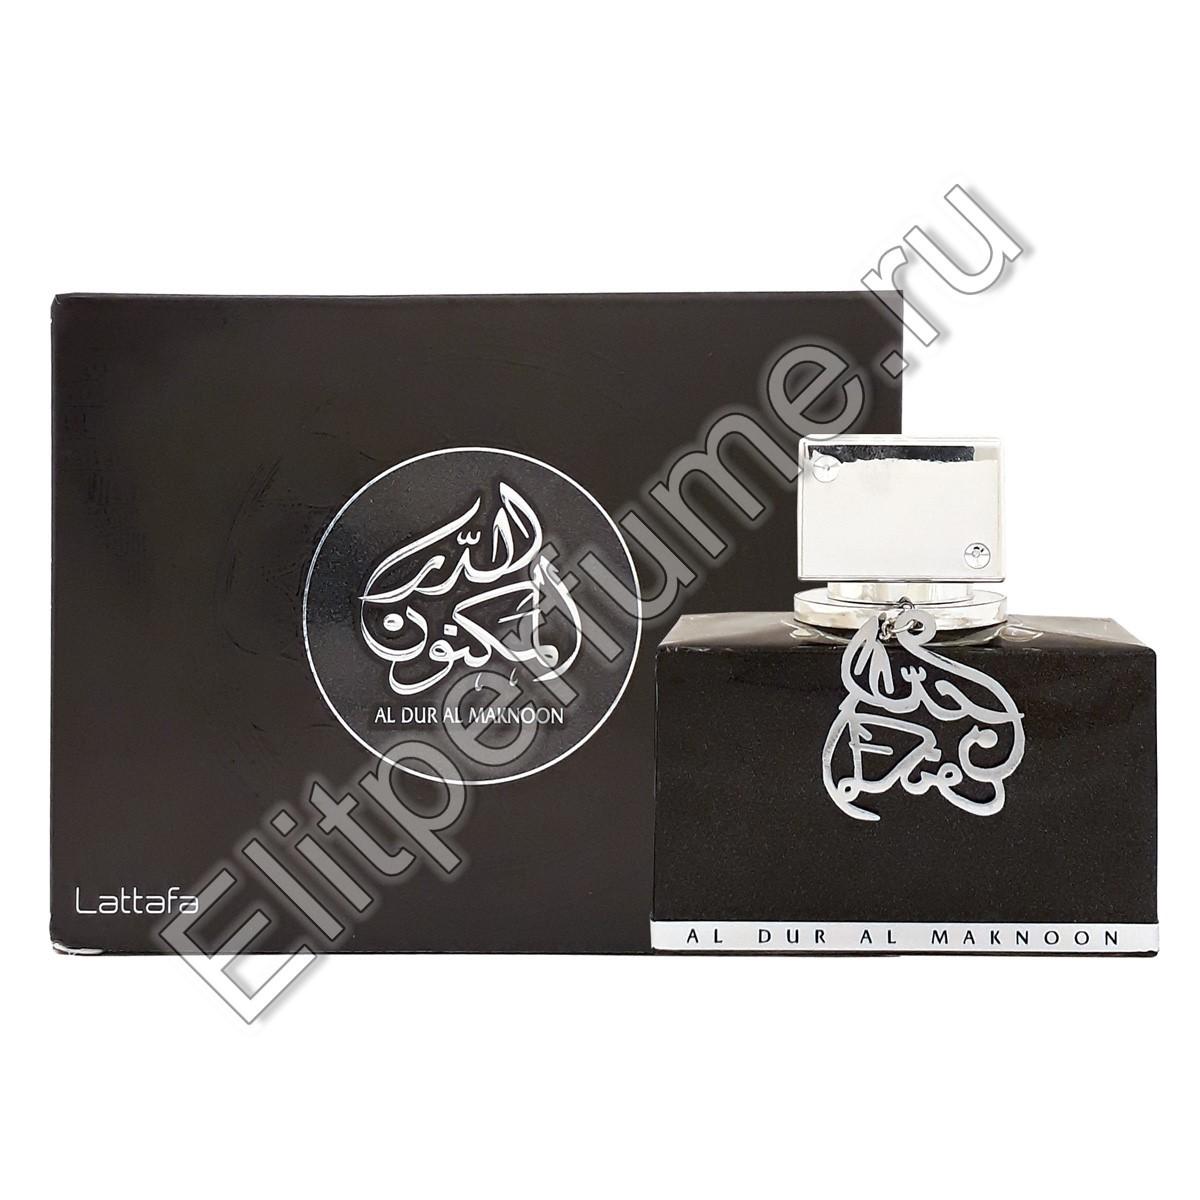 Al Dur Al Maknoon (Silver) u EDP 100 мл спрей от Lattafa Латтафа